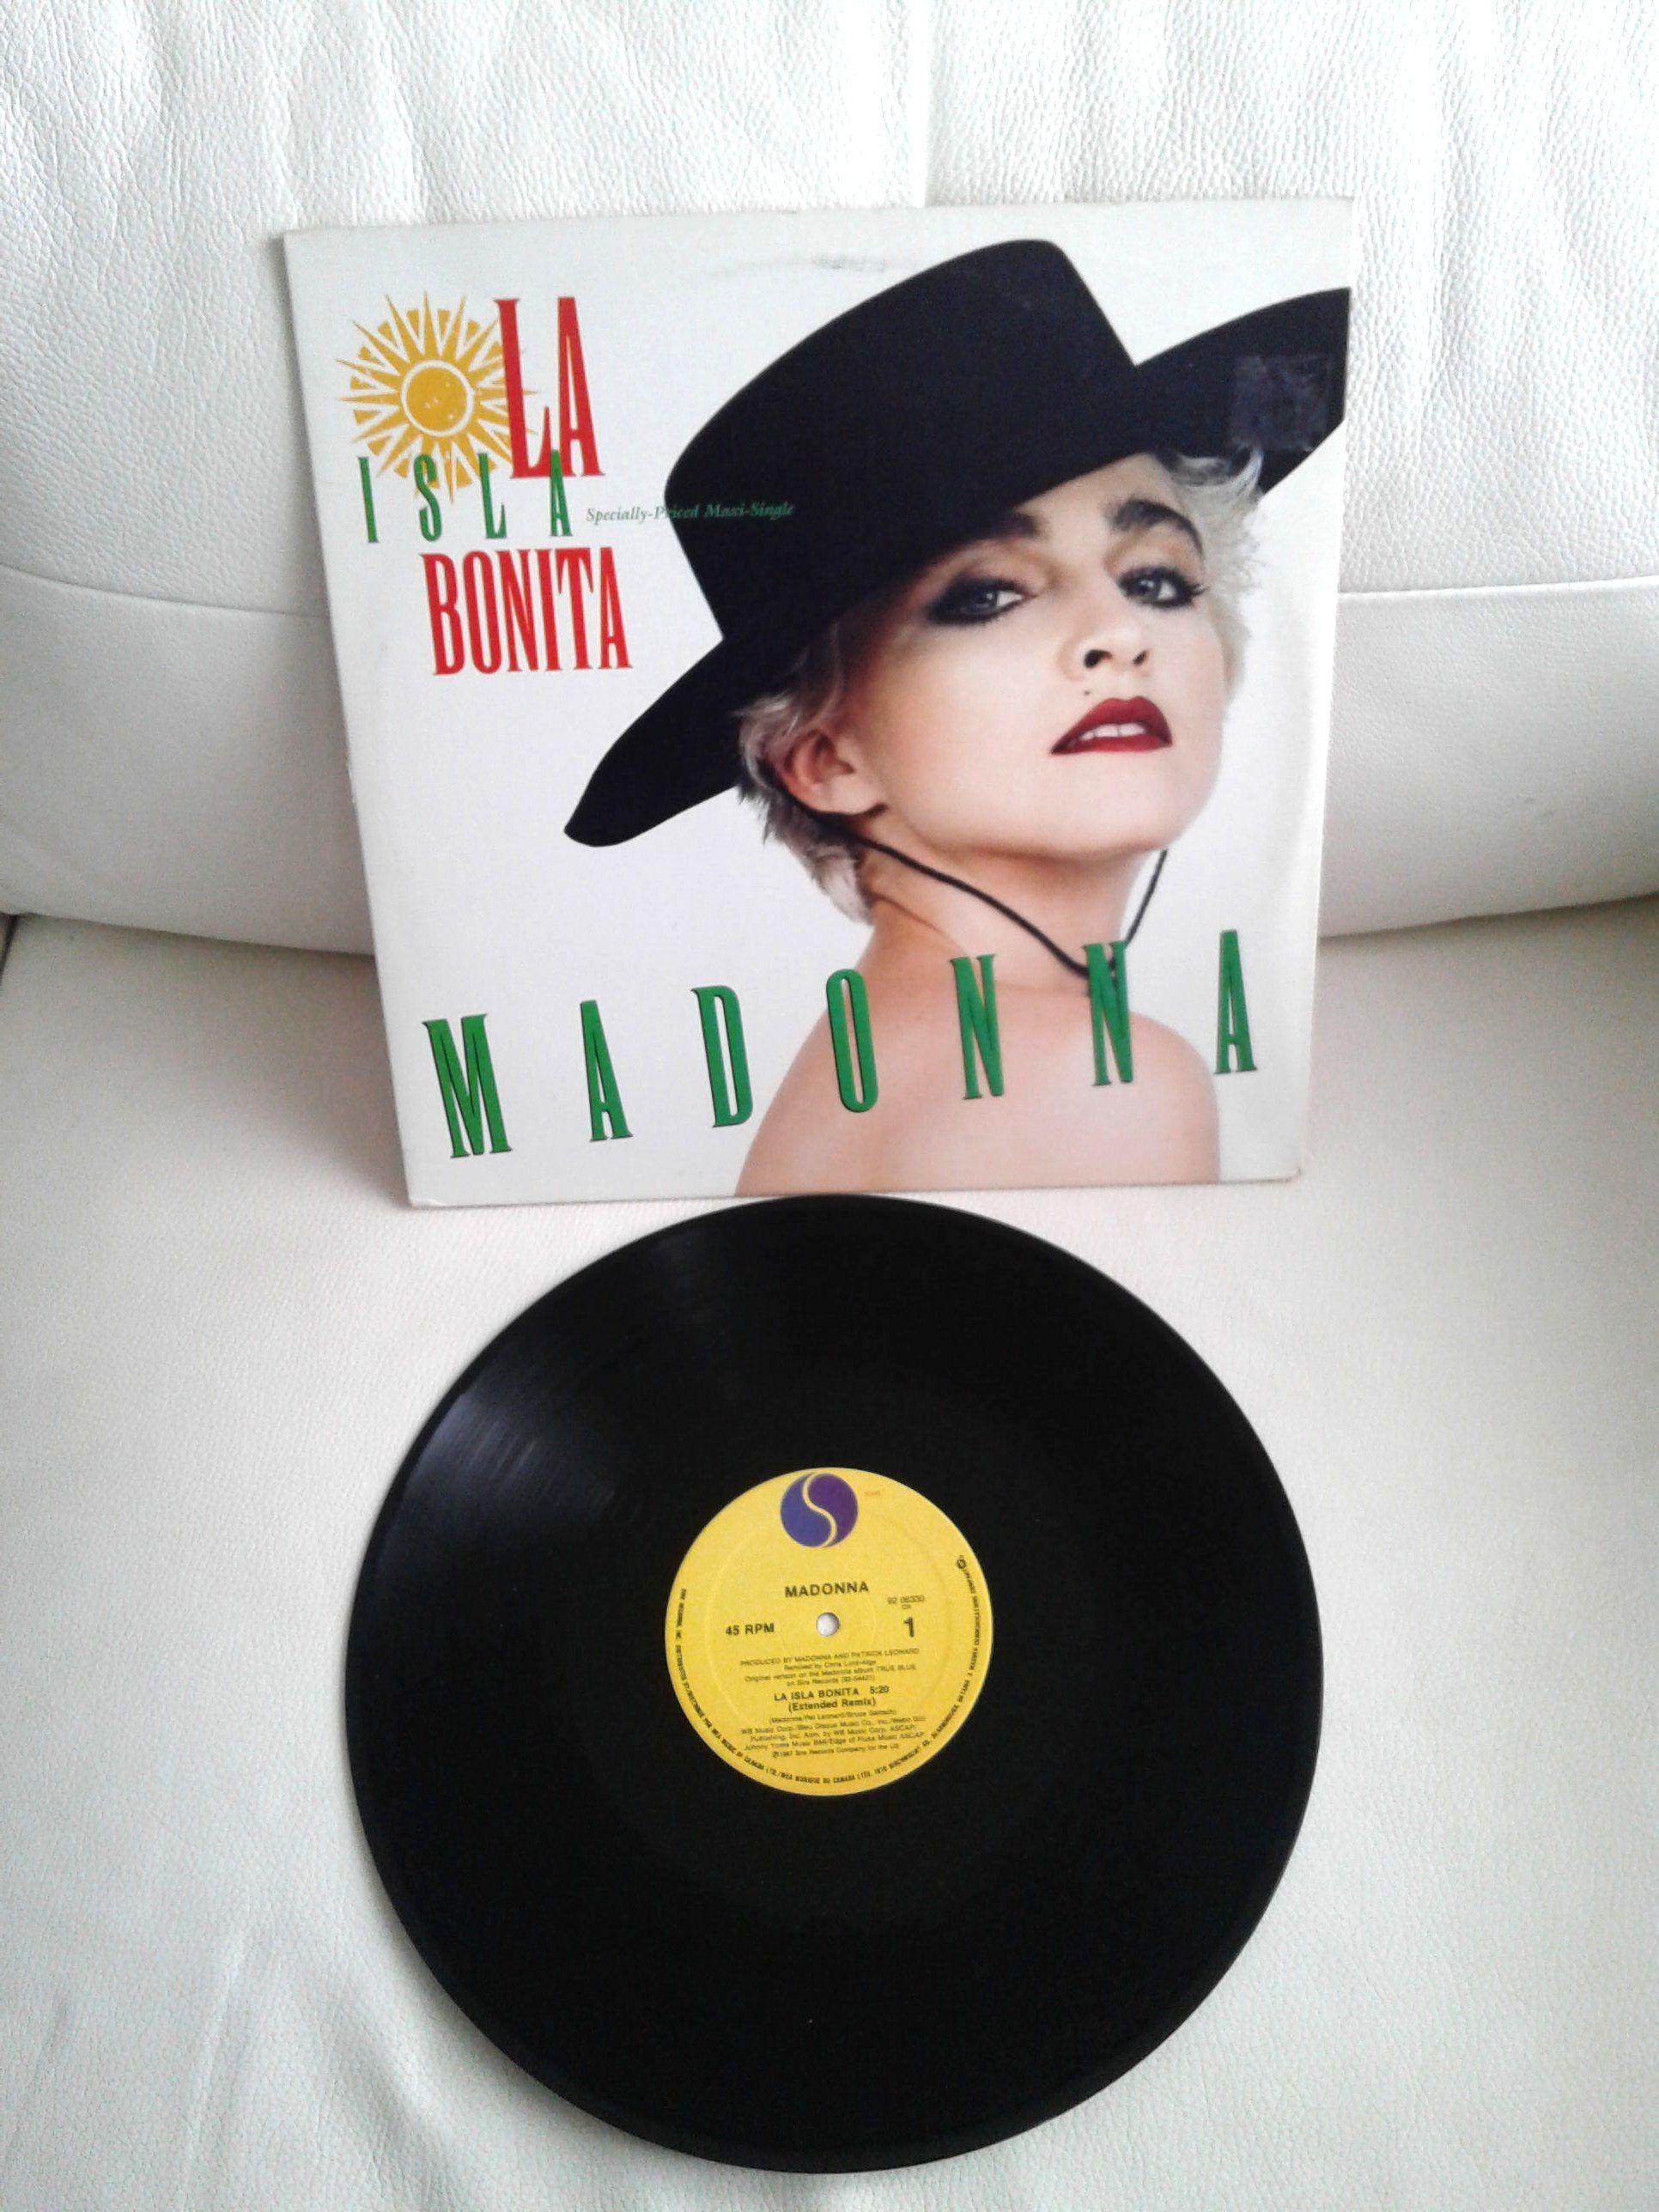 Vintage 1987 Madonna La Isla Bonita 12 Inches Vinyl Record Etsy Vinyl Records Madonna Vinyl